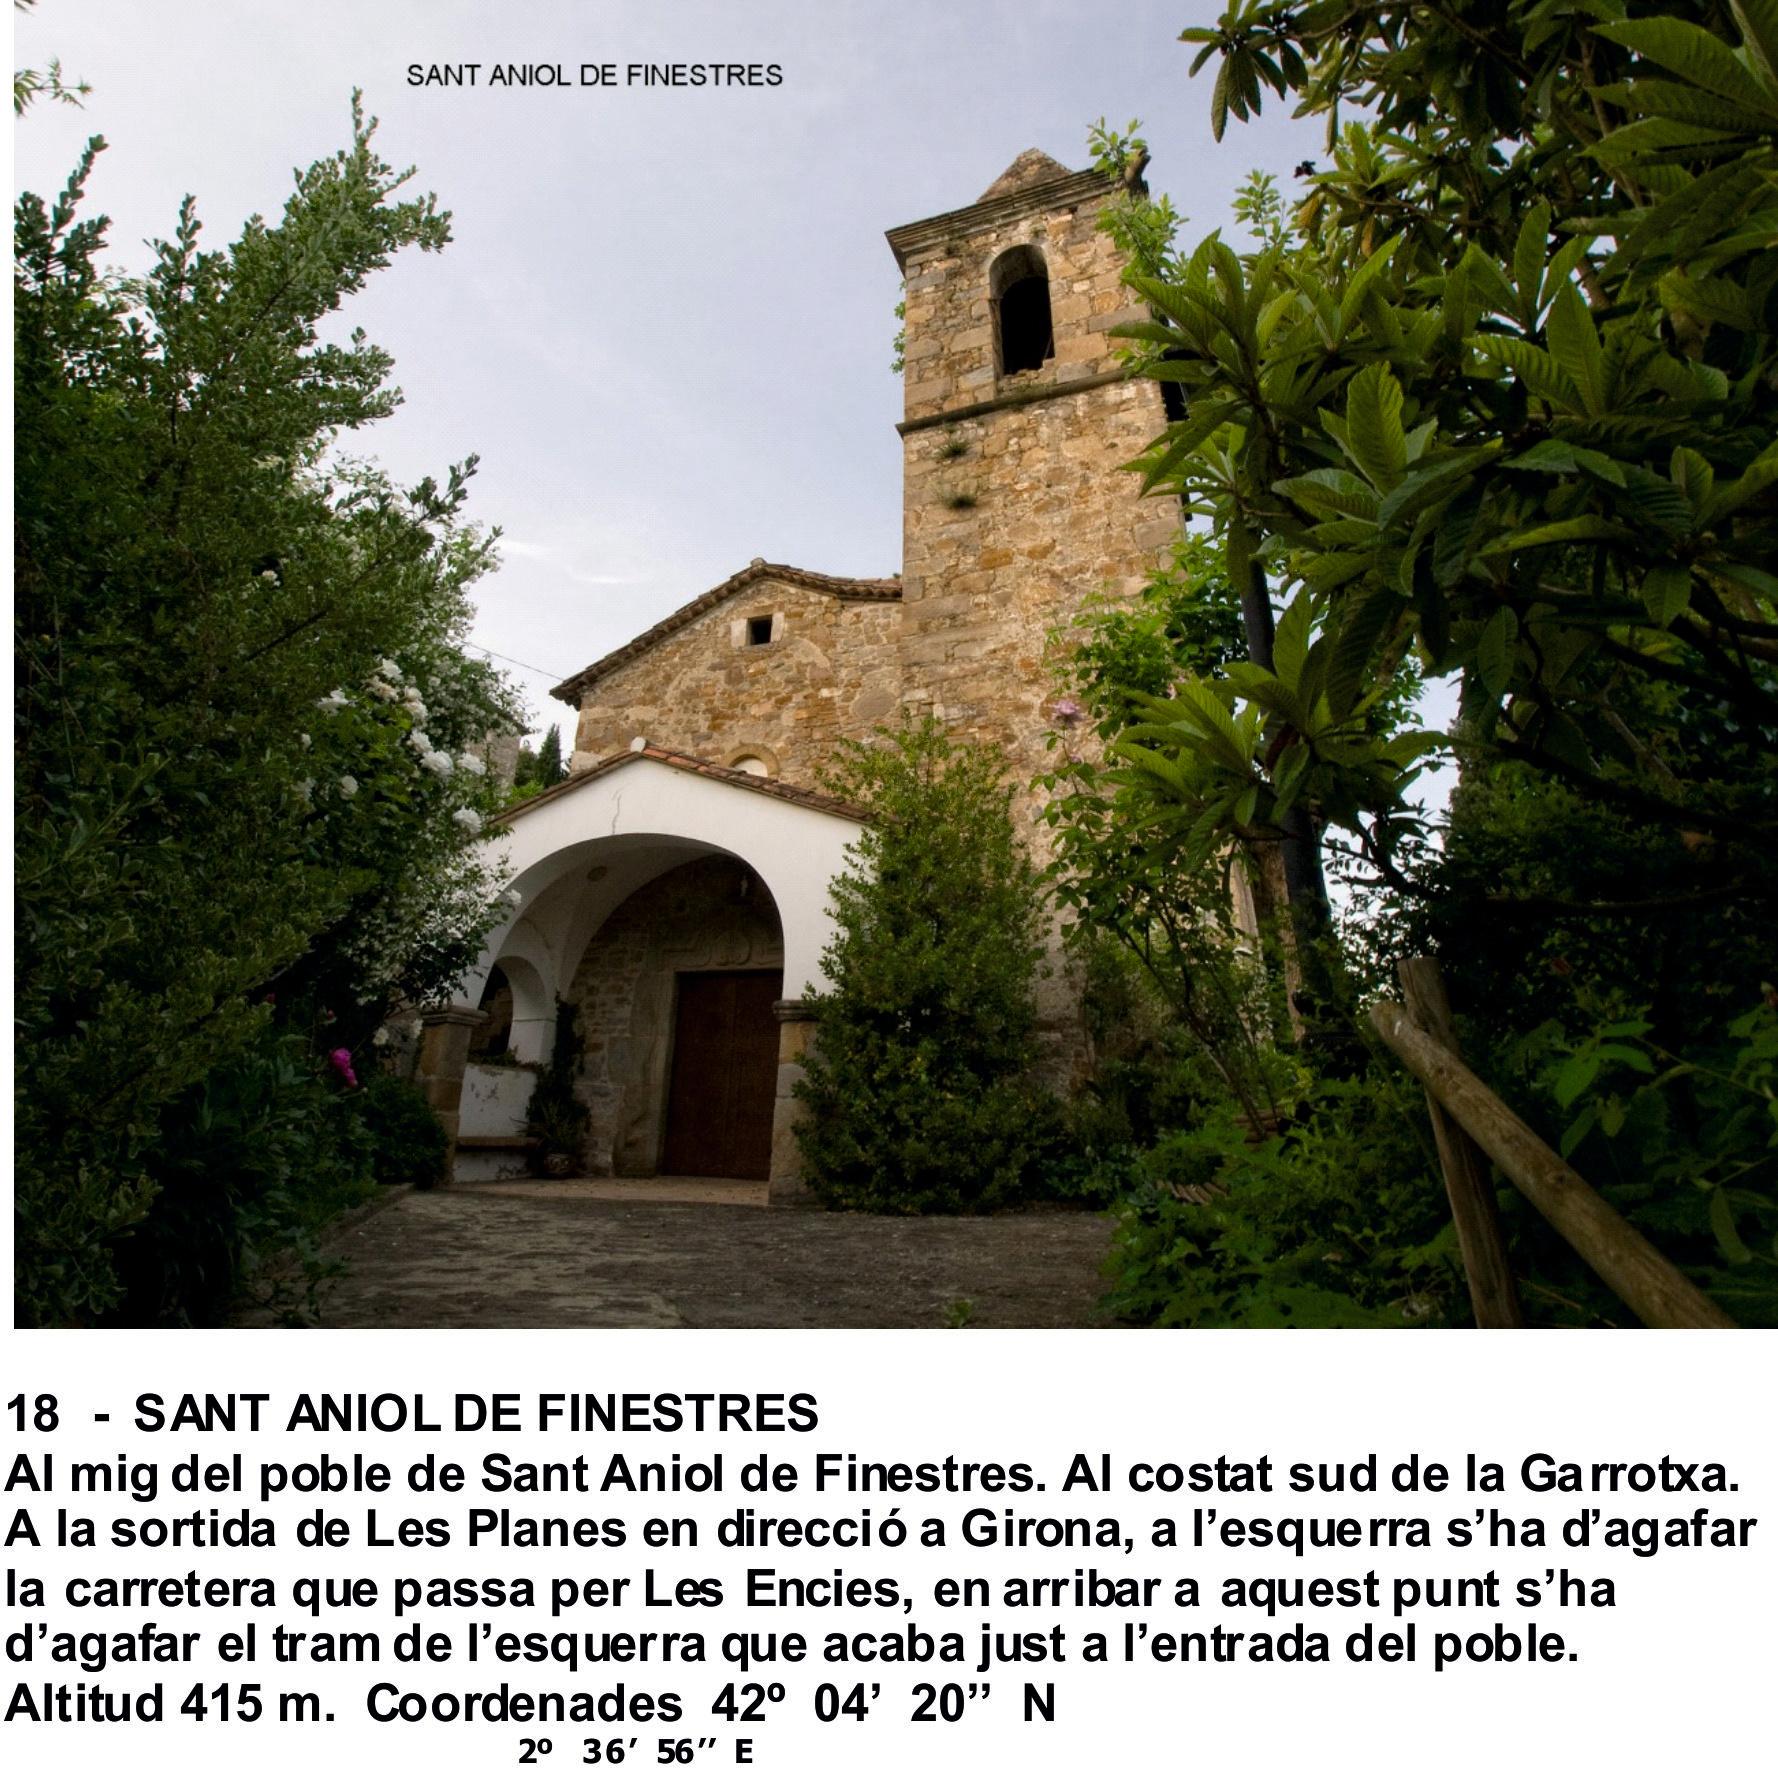 18  -  SANT ANIOL DE FINESTRES